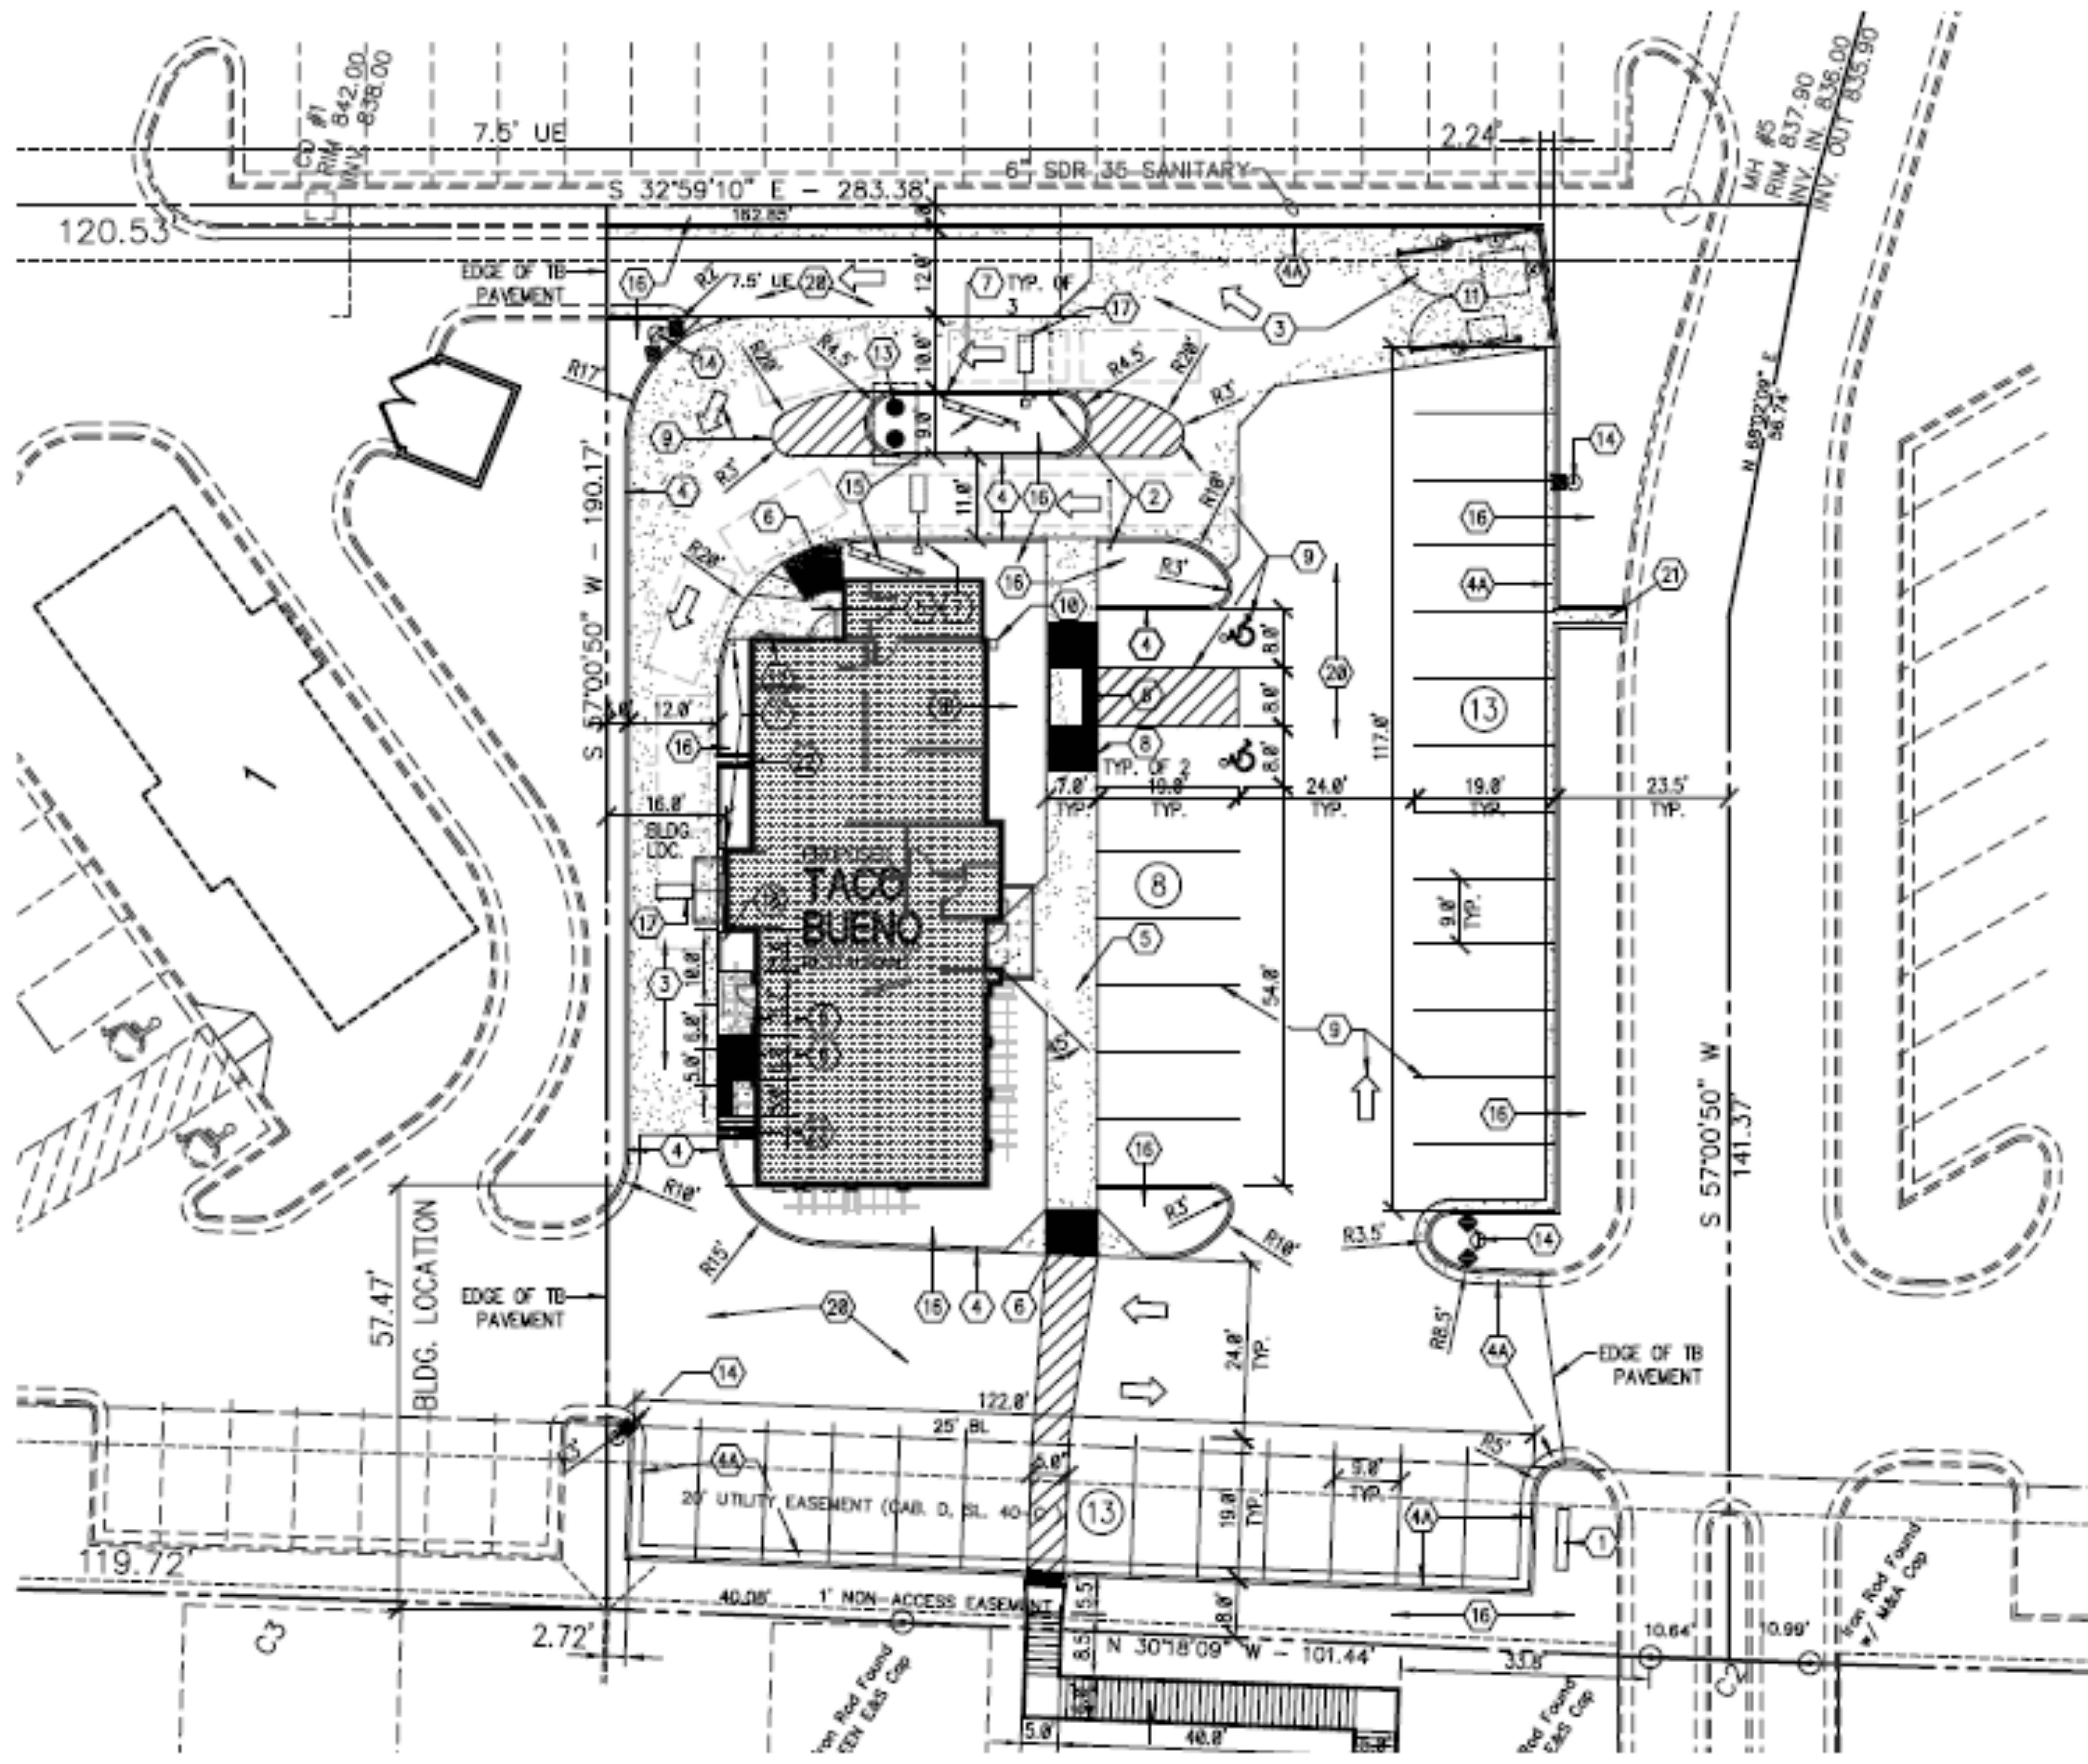 Harker Heights QSR Bldg: site plan